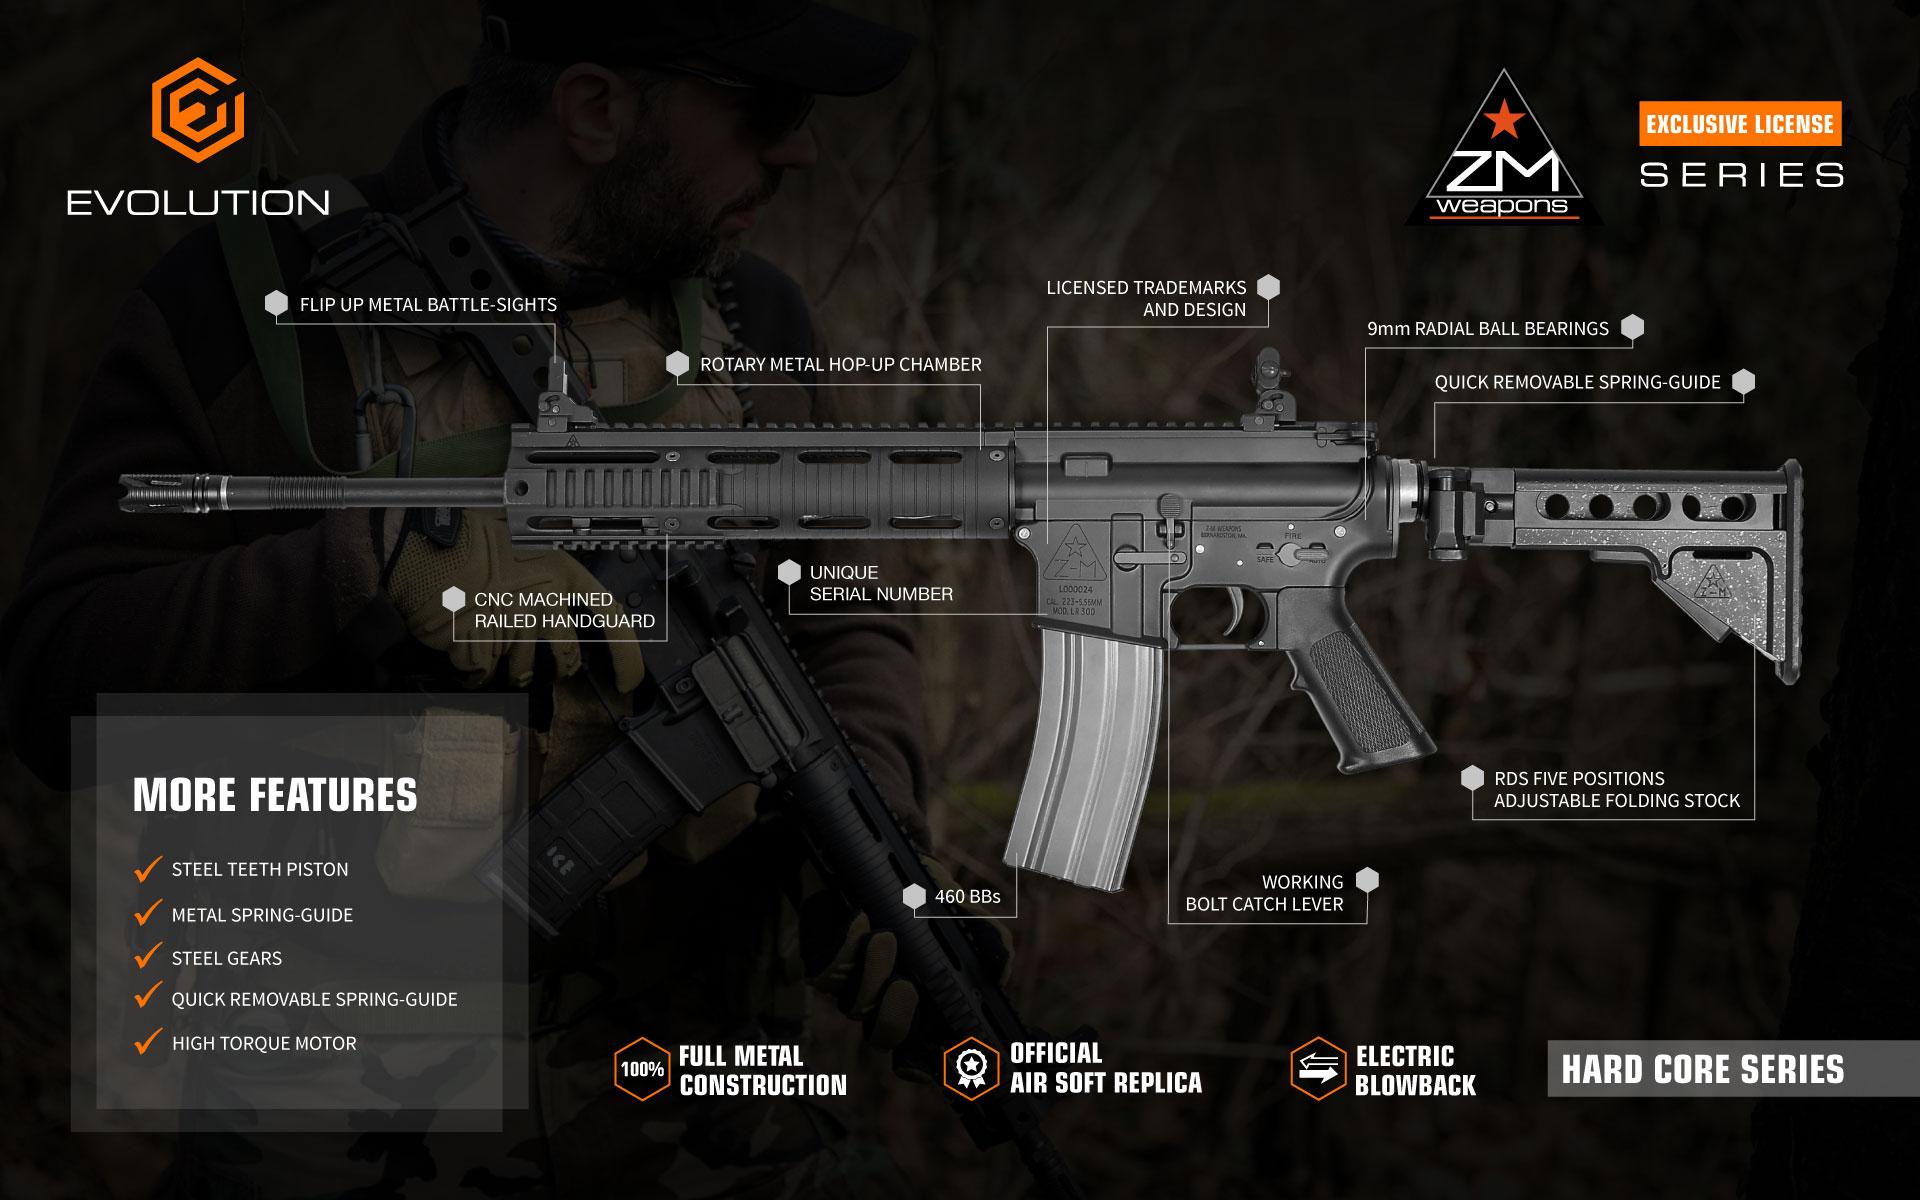 Evolution Z-M Weapons air soft guns